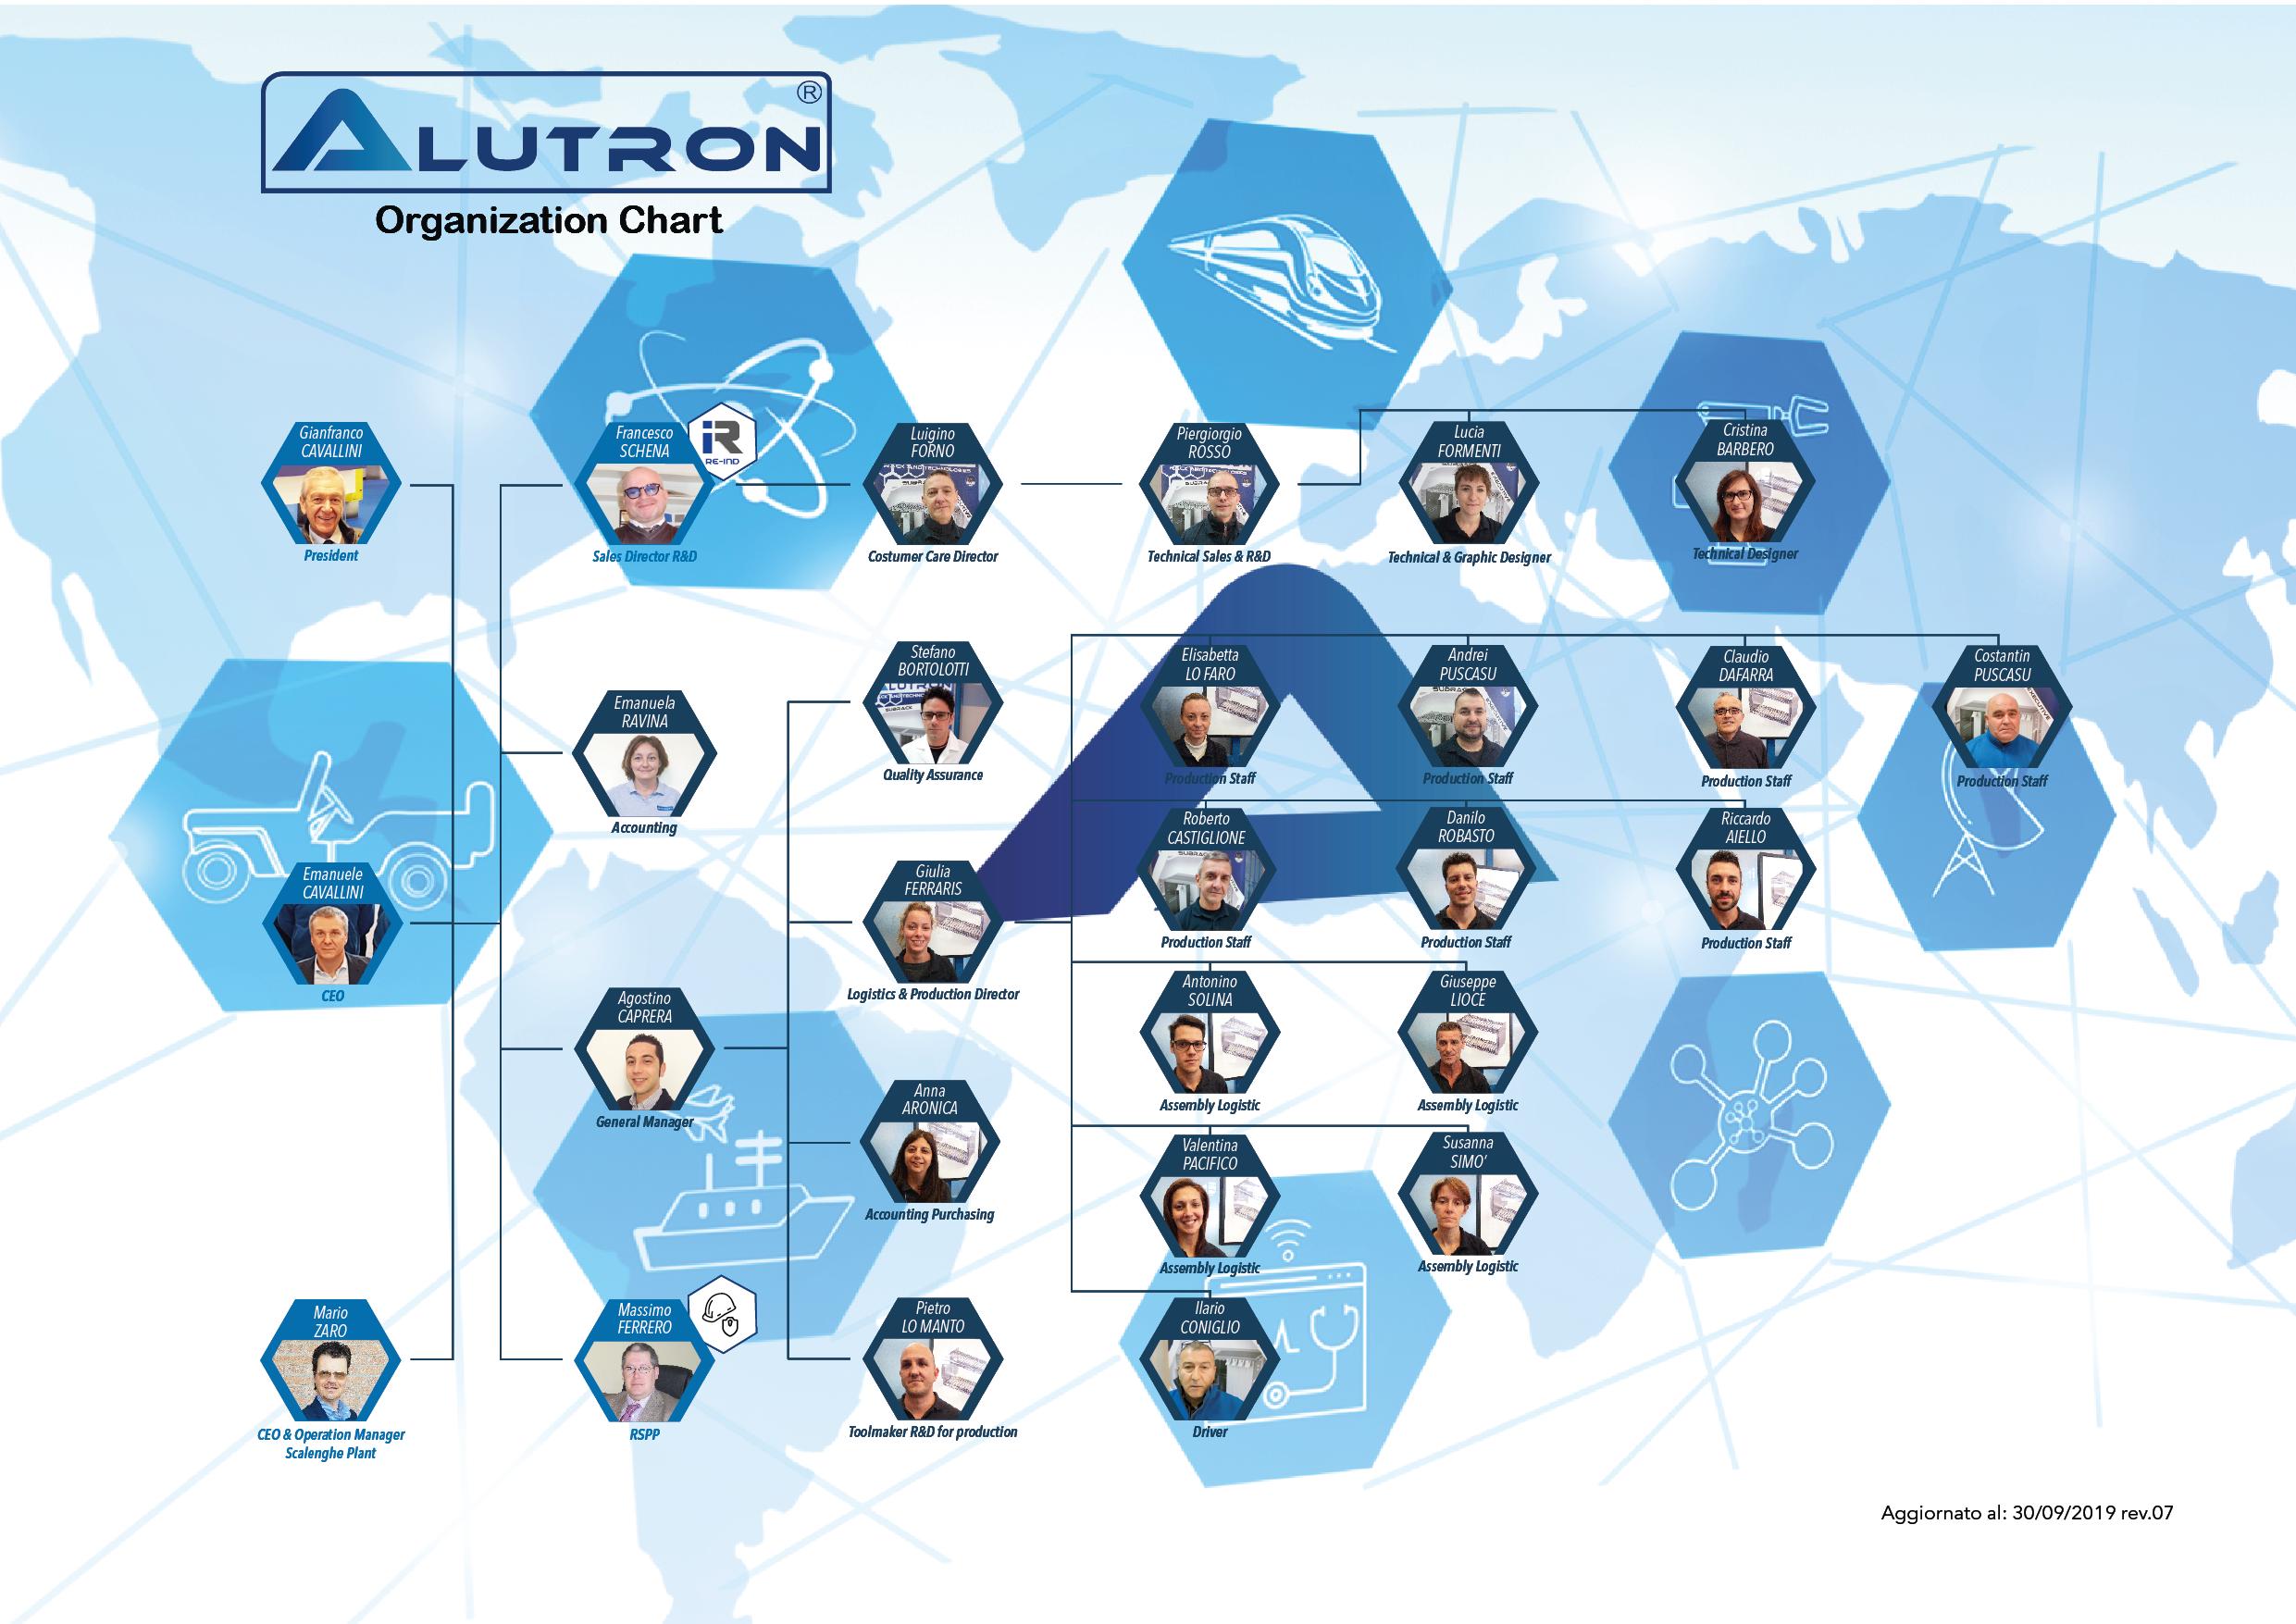 Alutron_Organigramma_30_09_2019-01